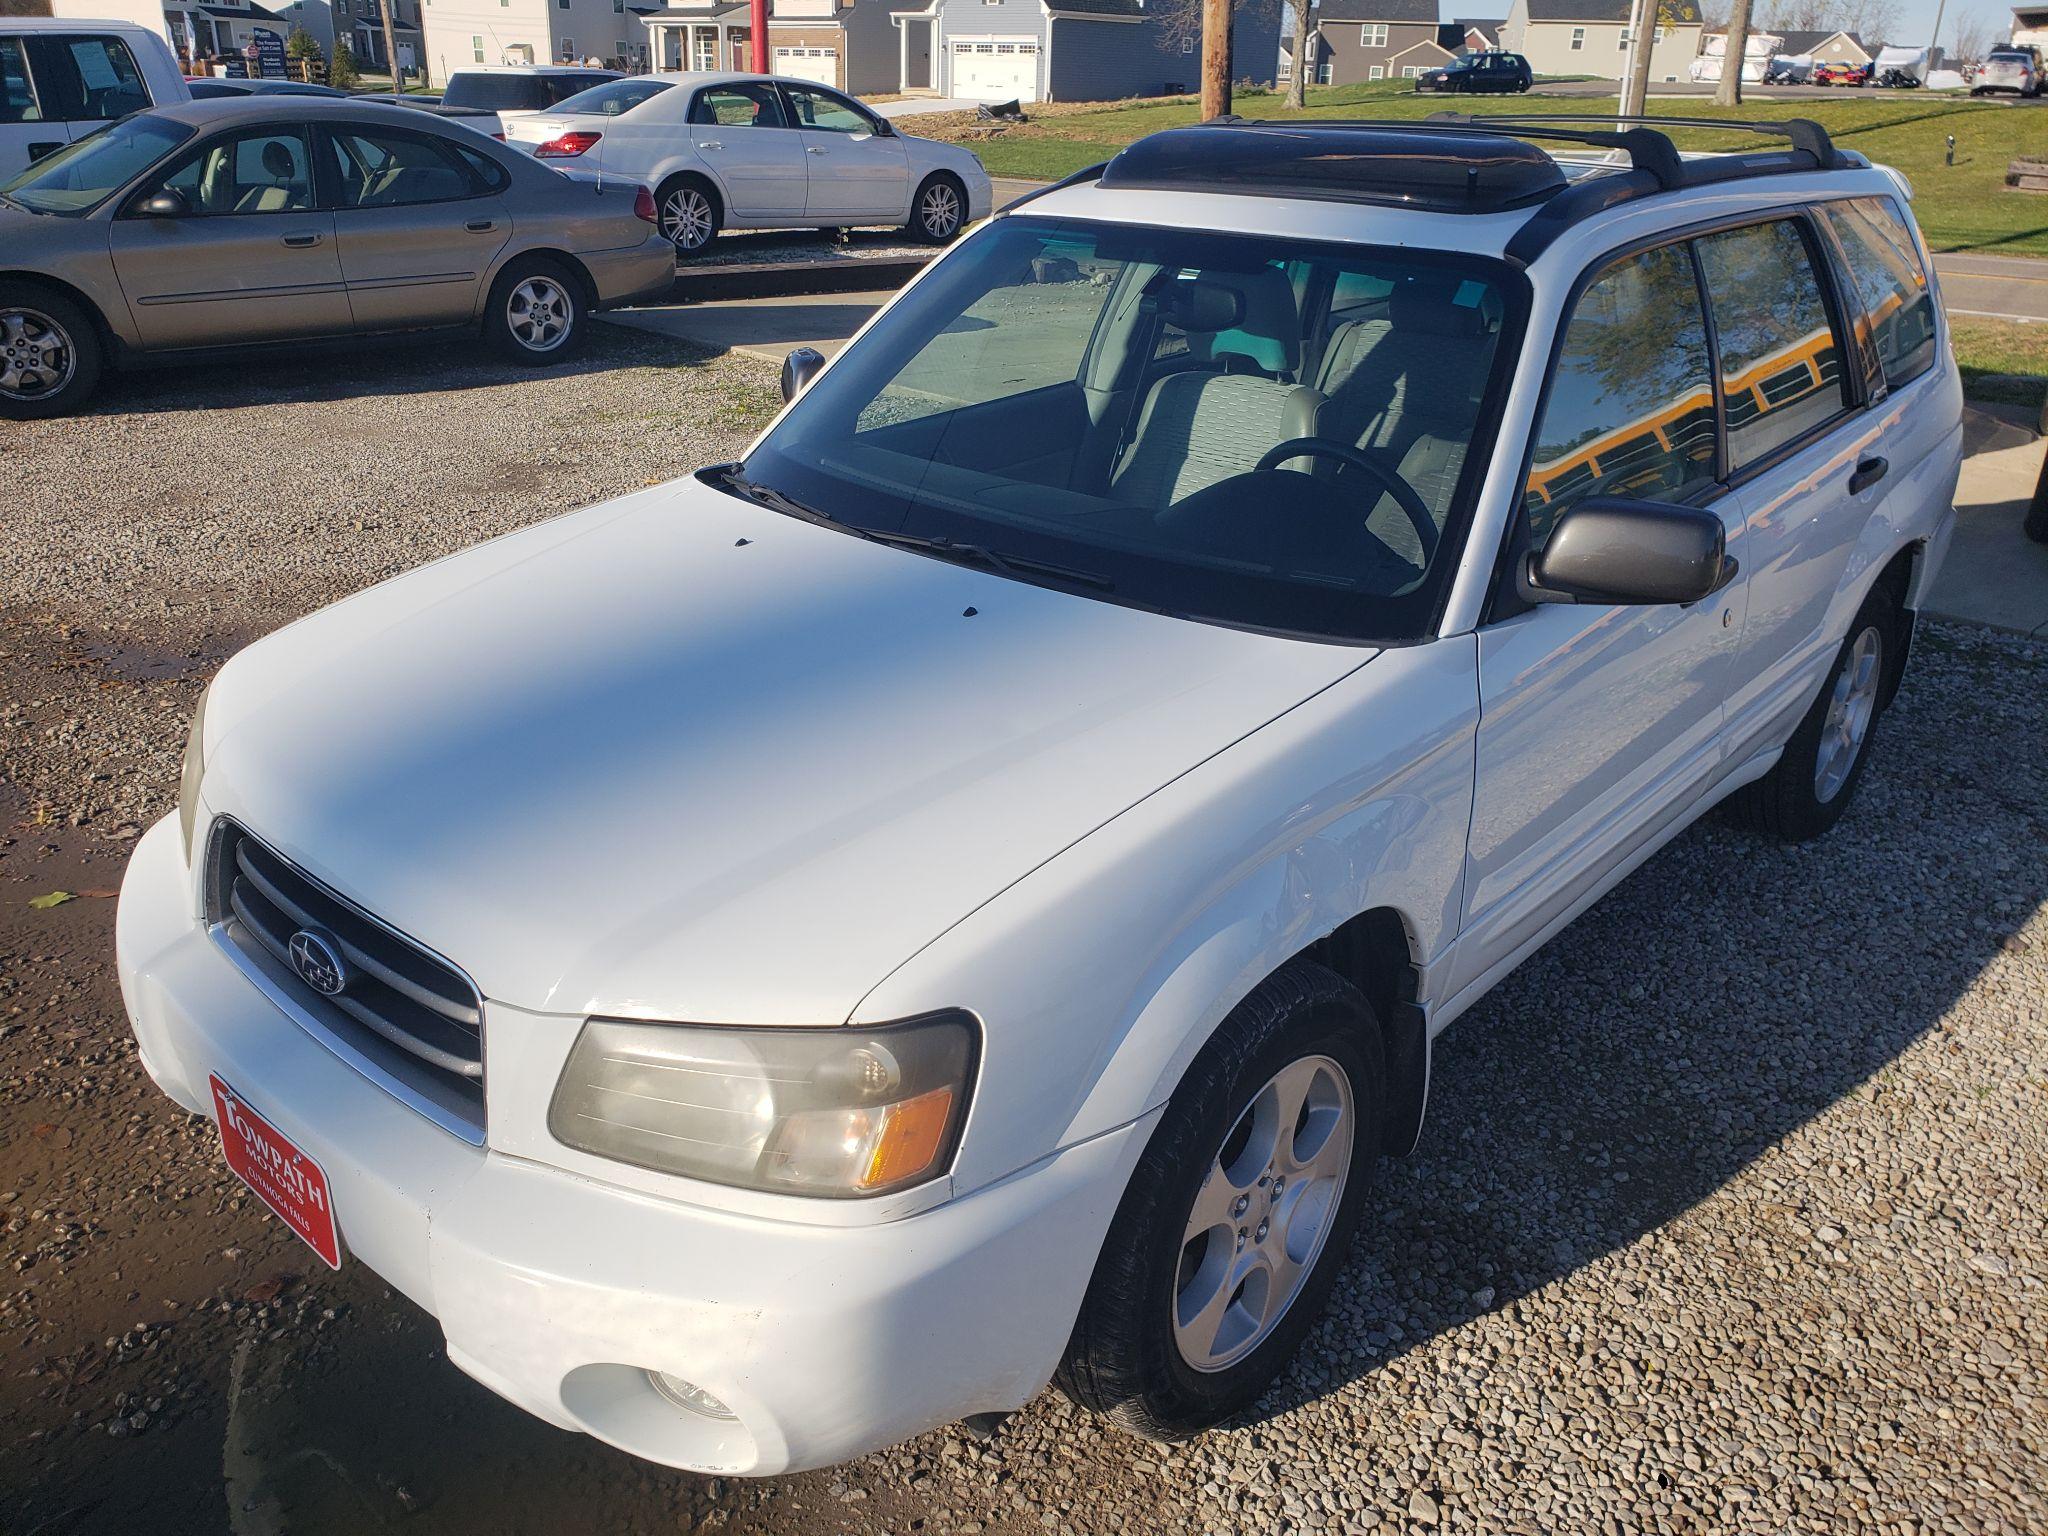 2003 Subaru Forester for sale at Towpath Motors | Used Car Dealer in Peninsula Ohio